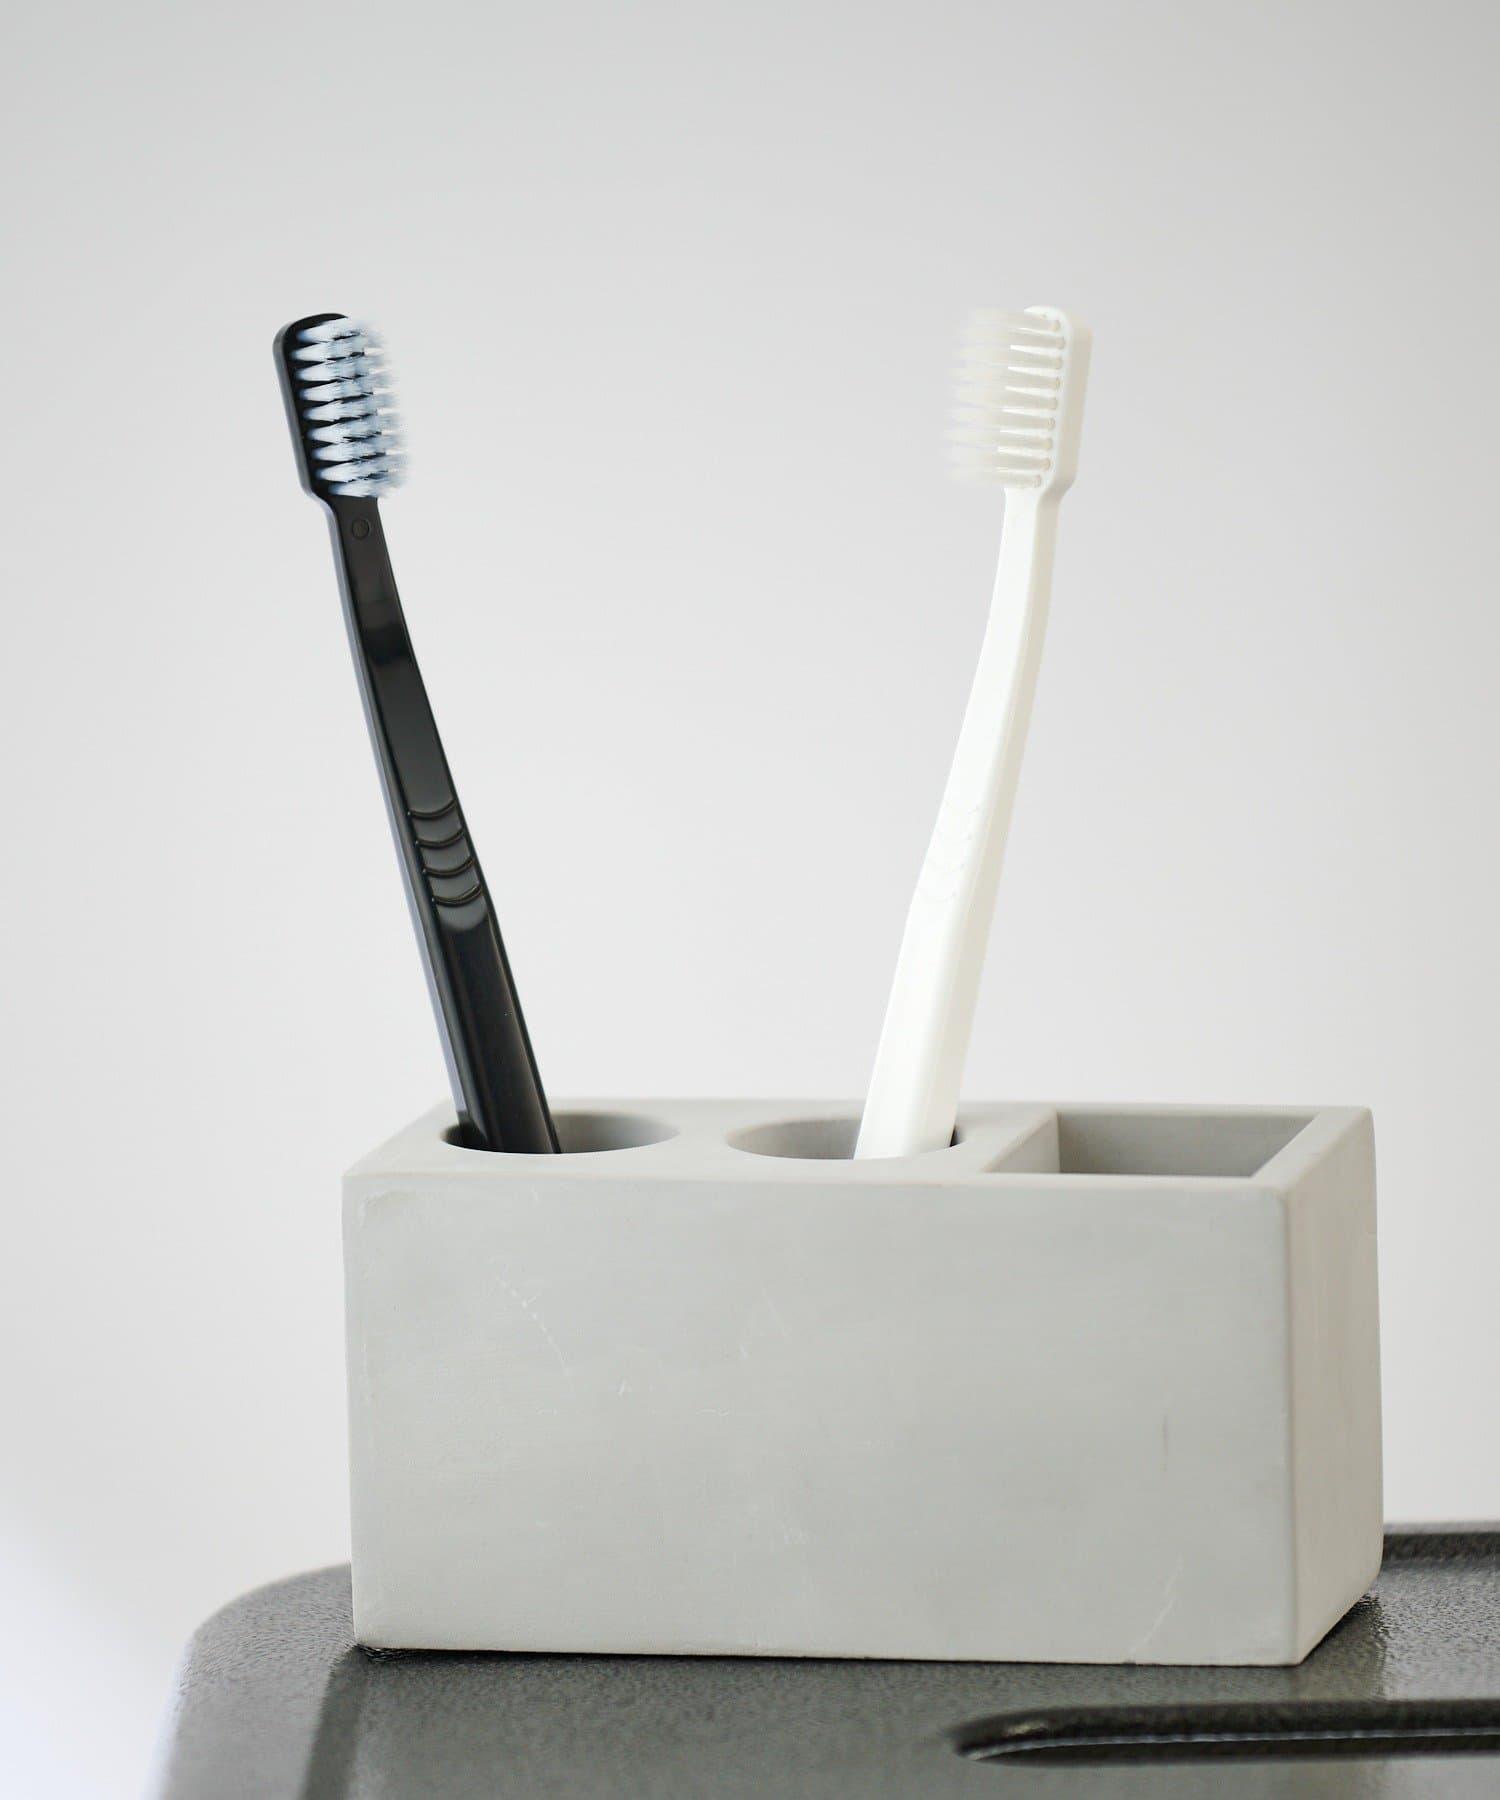 COLONY 2139(コロニー トゥーワンスリーナイン) ライフスタイル 珪藻土トゥースブラシスタンド/歯ブラシ立て[使用動画あり] グレー